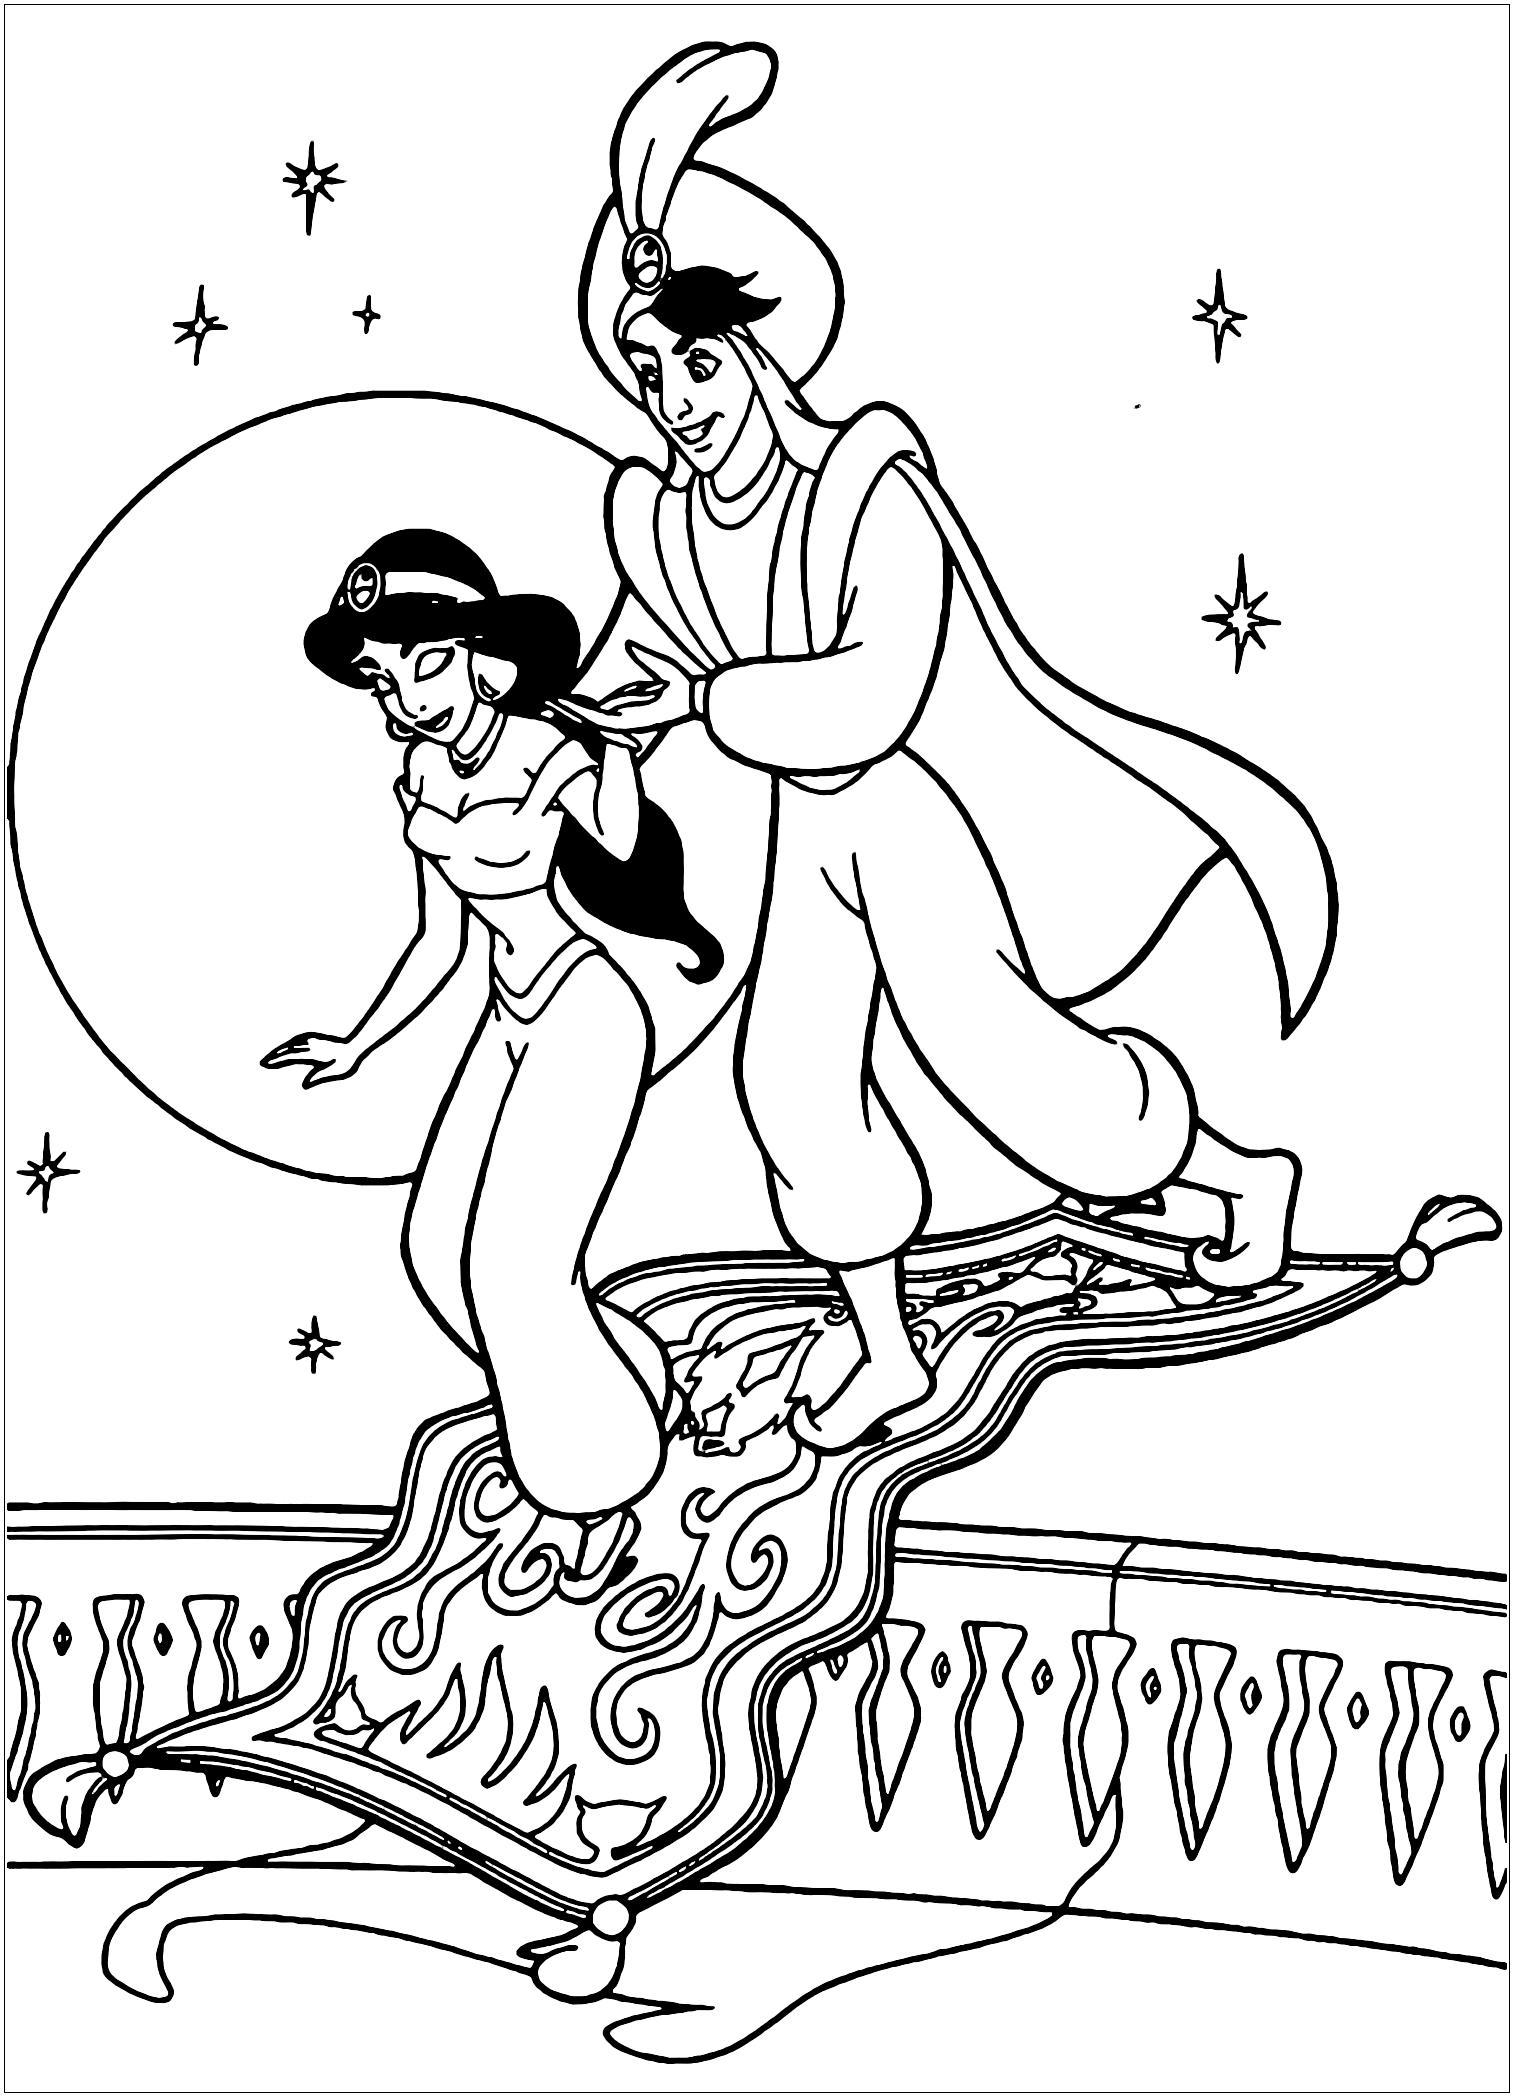 Aladdin et Jasmine, personnages Disney - Coloriage Aladdin ...